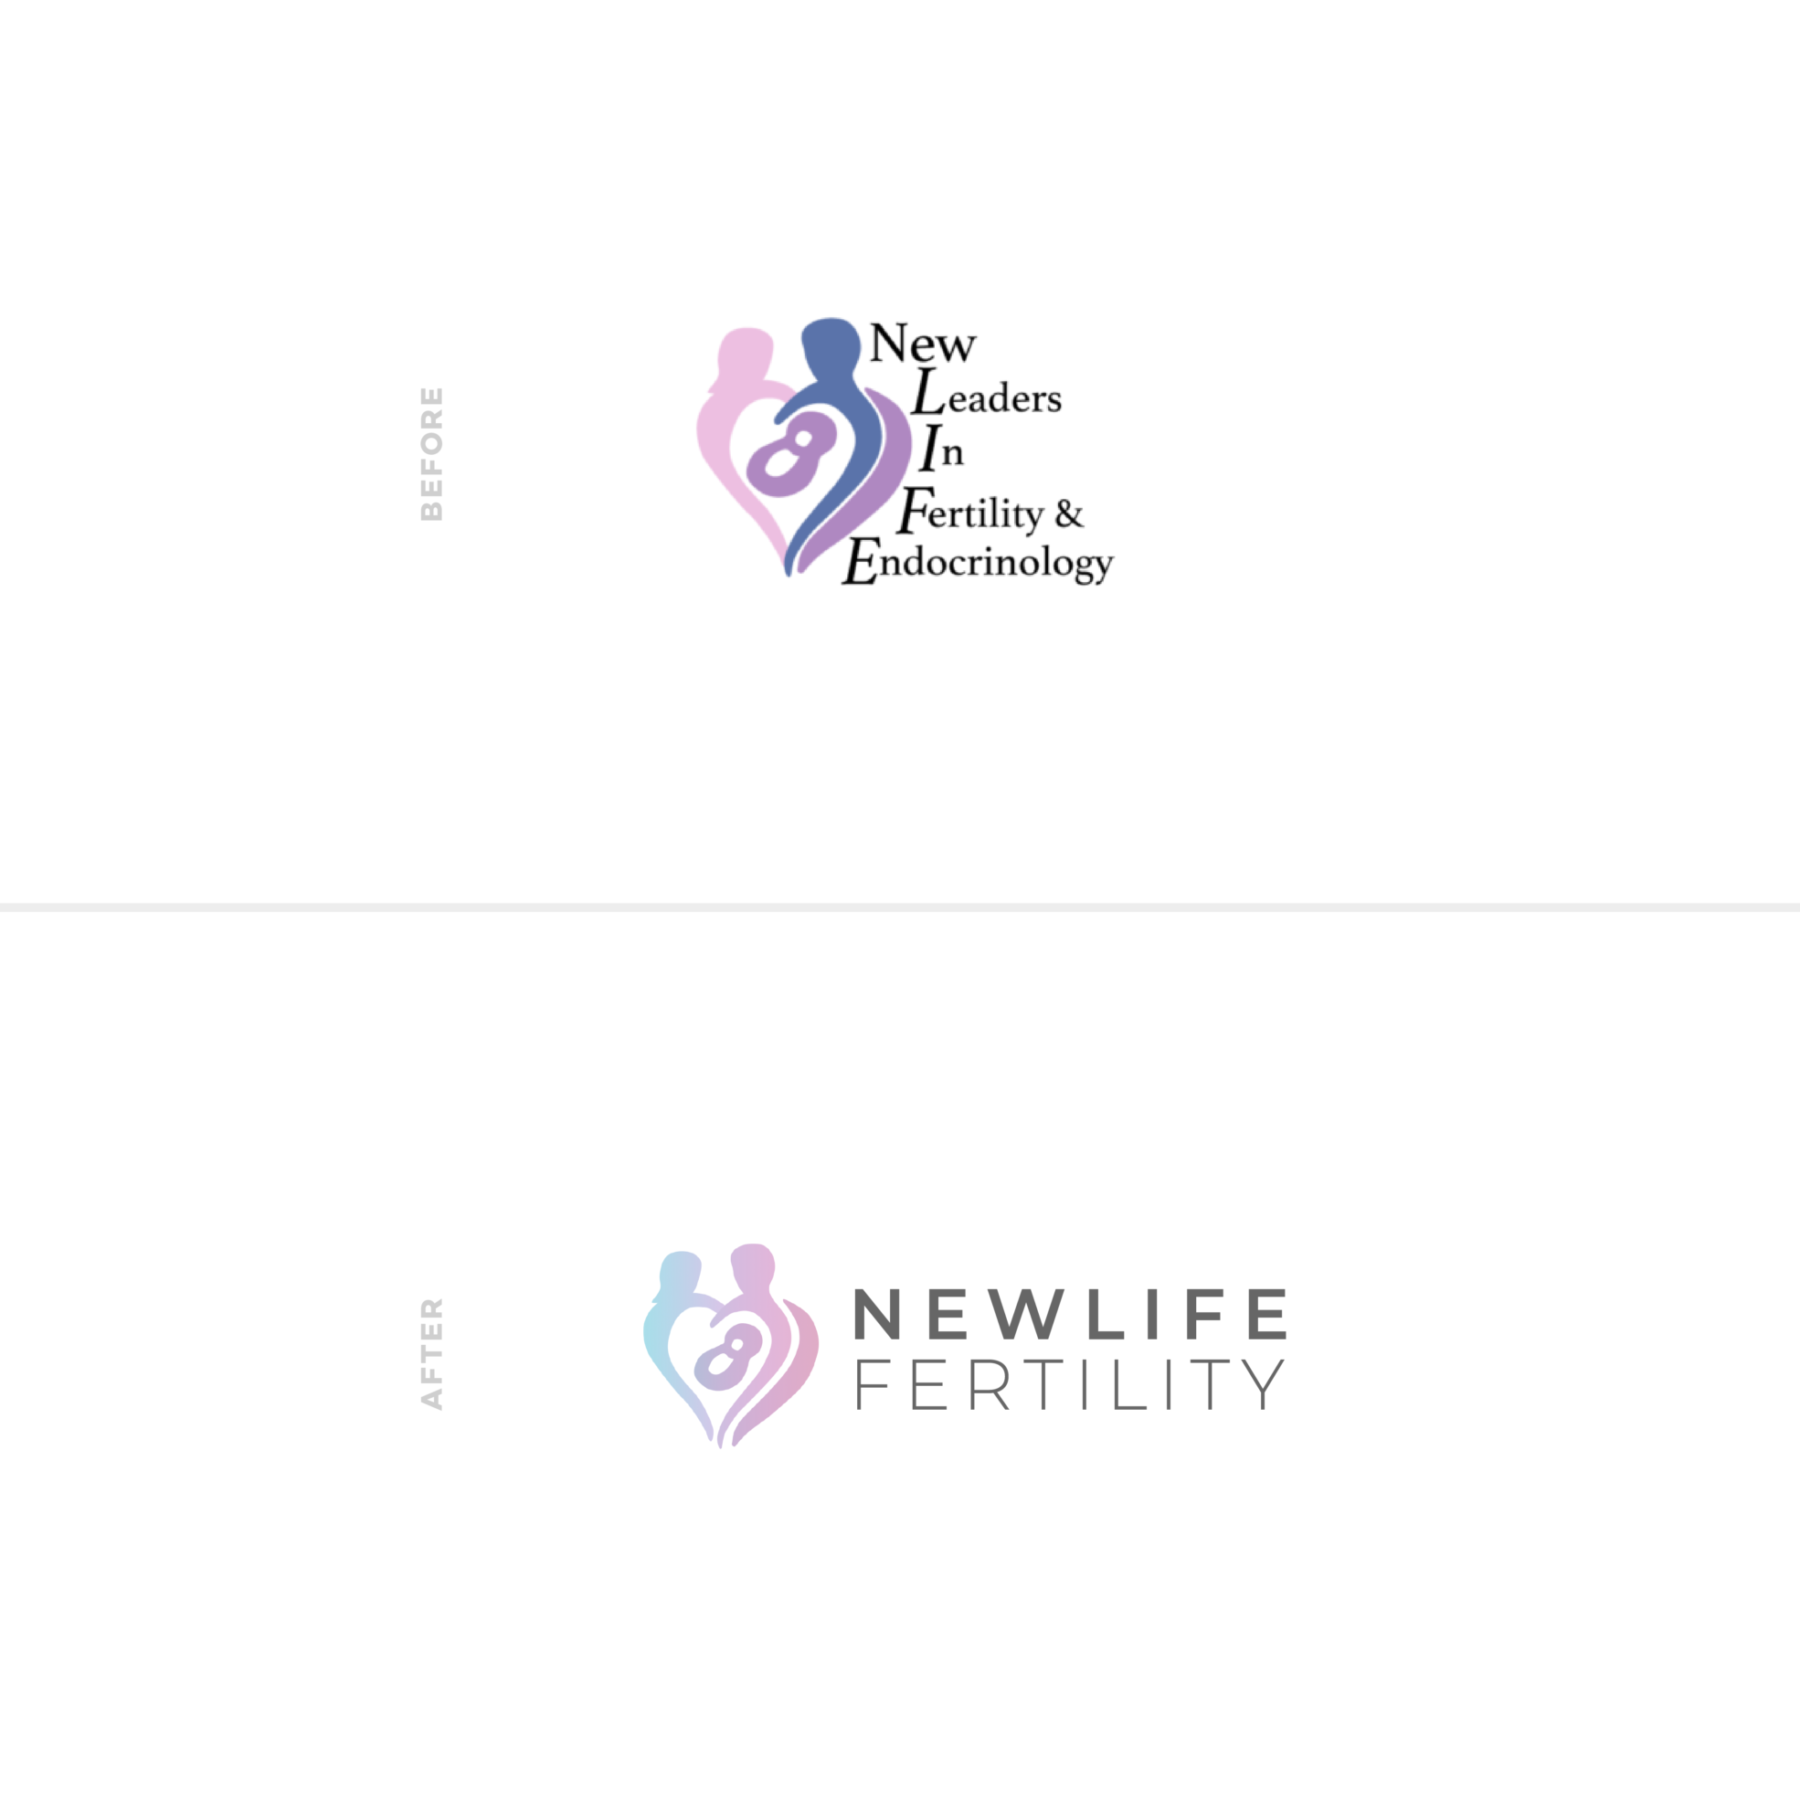 NewLIFE Fertility | Before & After